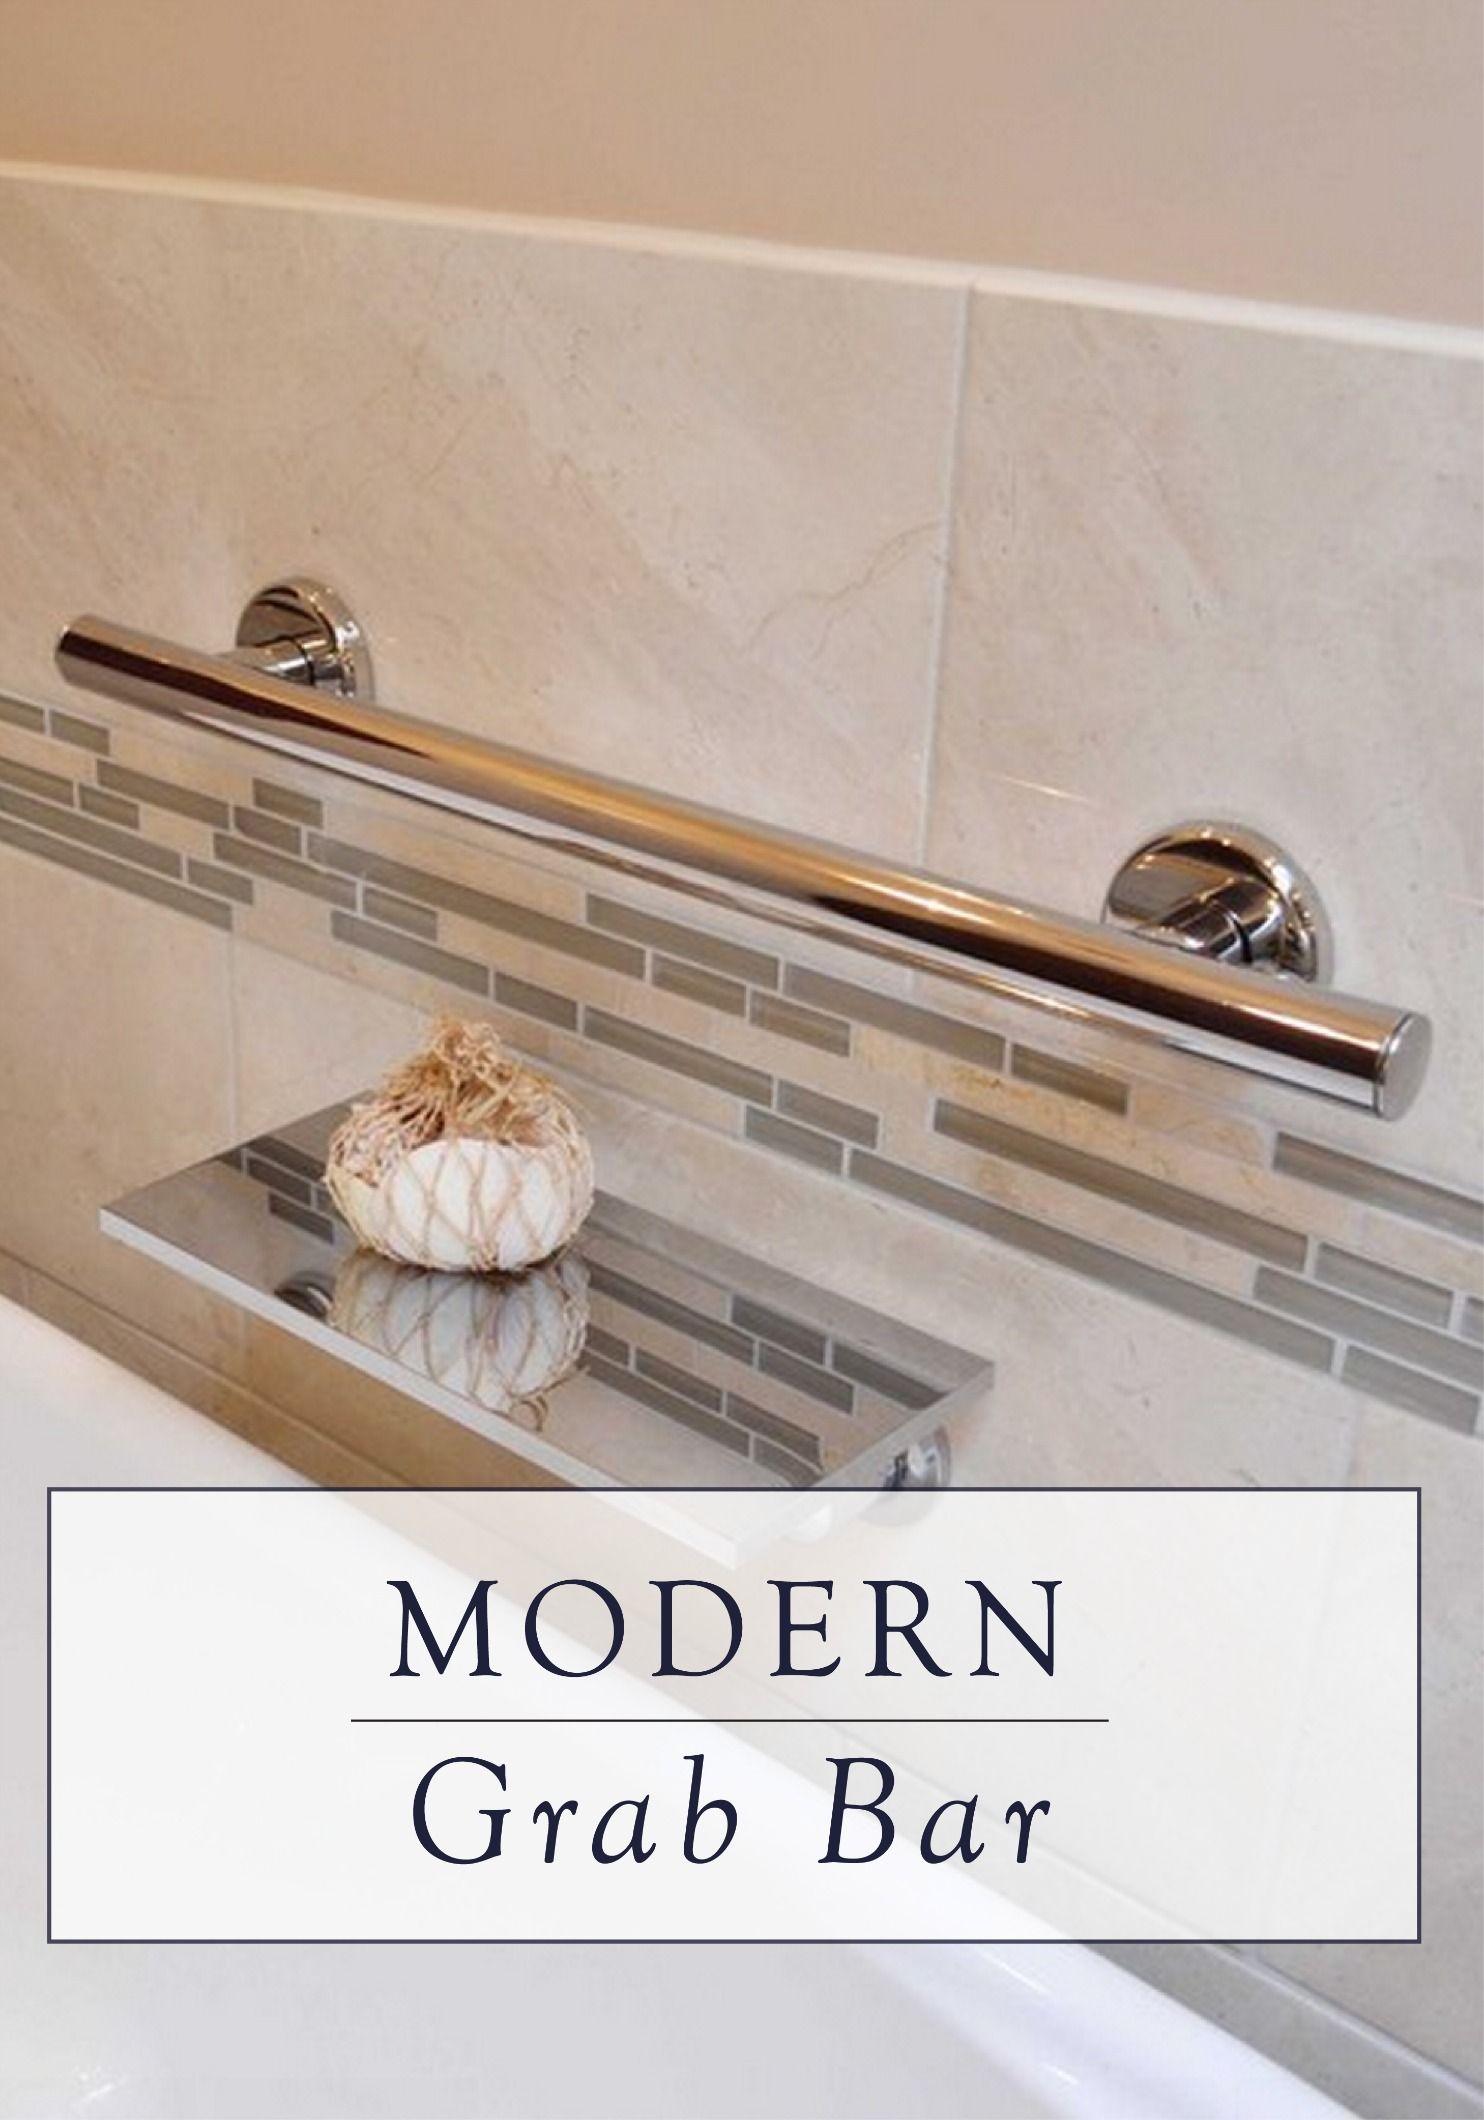 categories safety bathtub bath medsource pinnacle